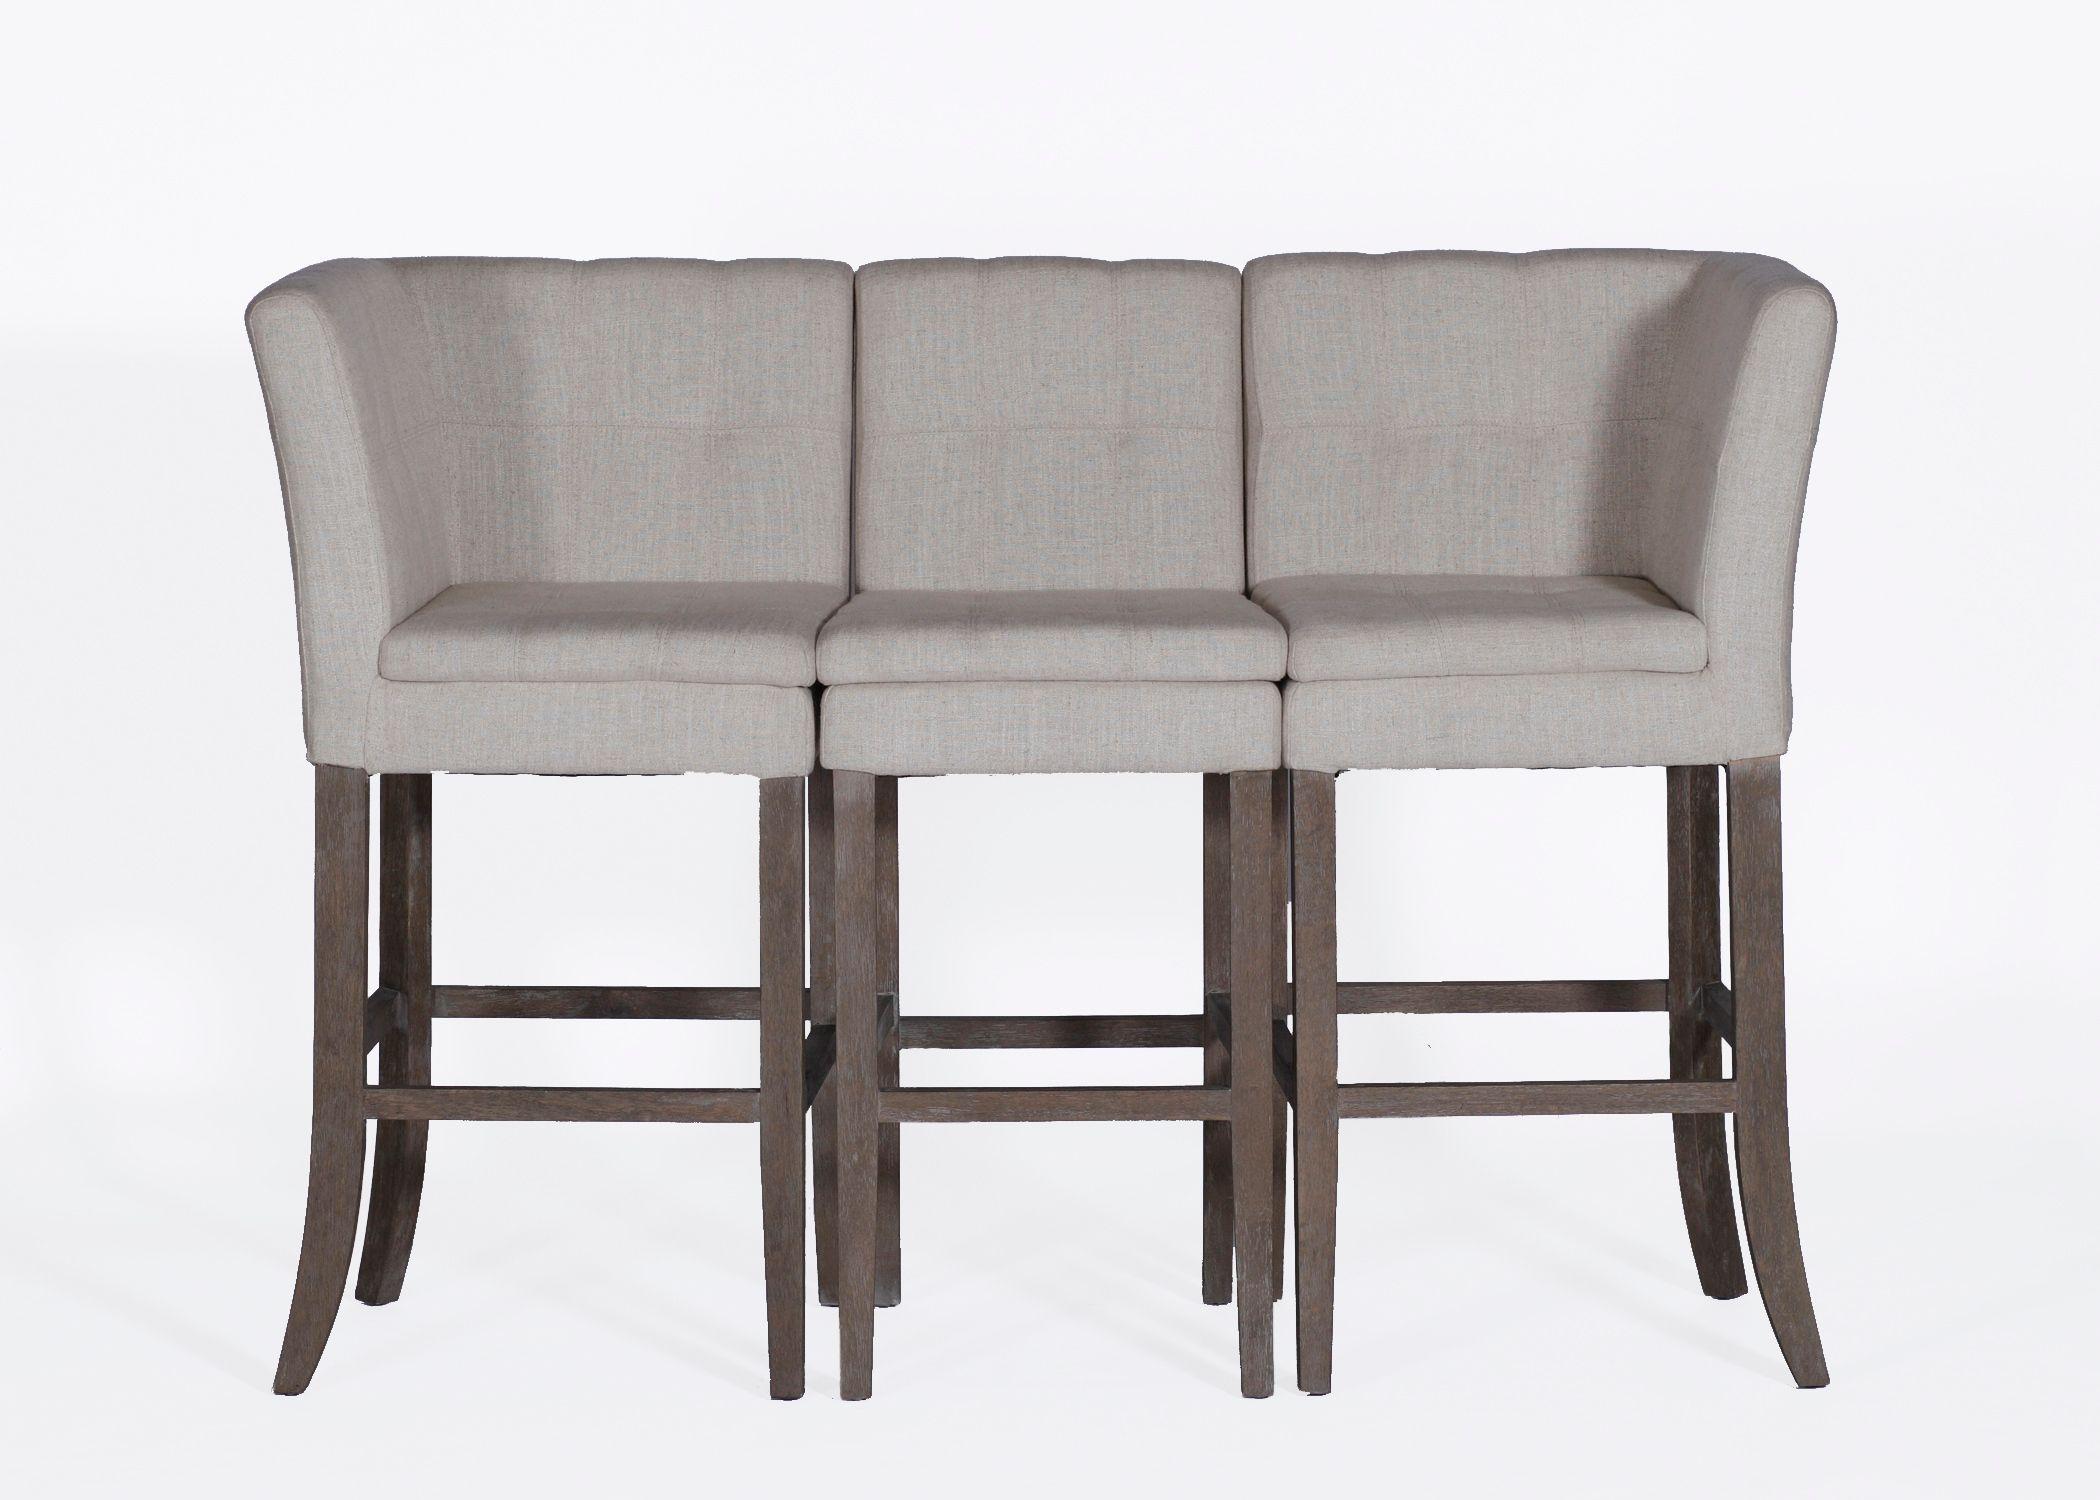 Island bench stools Casa Clawson Pinterest